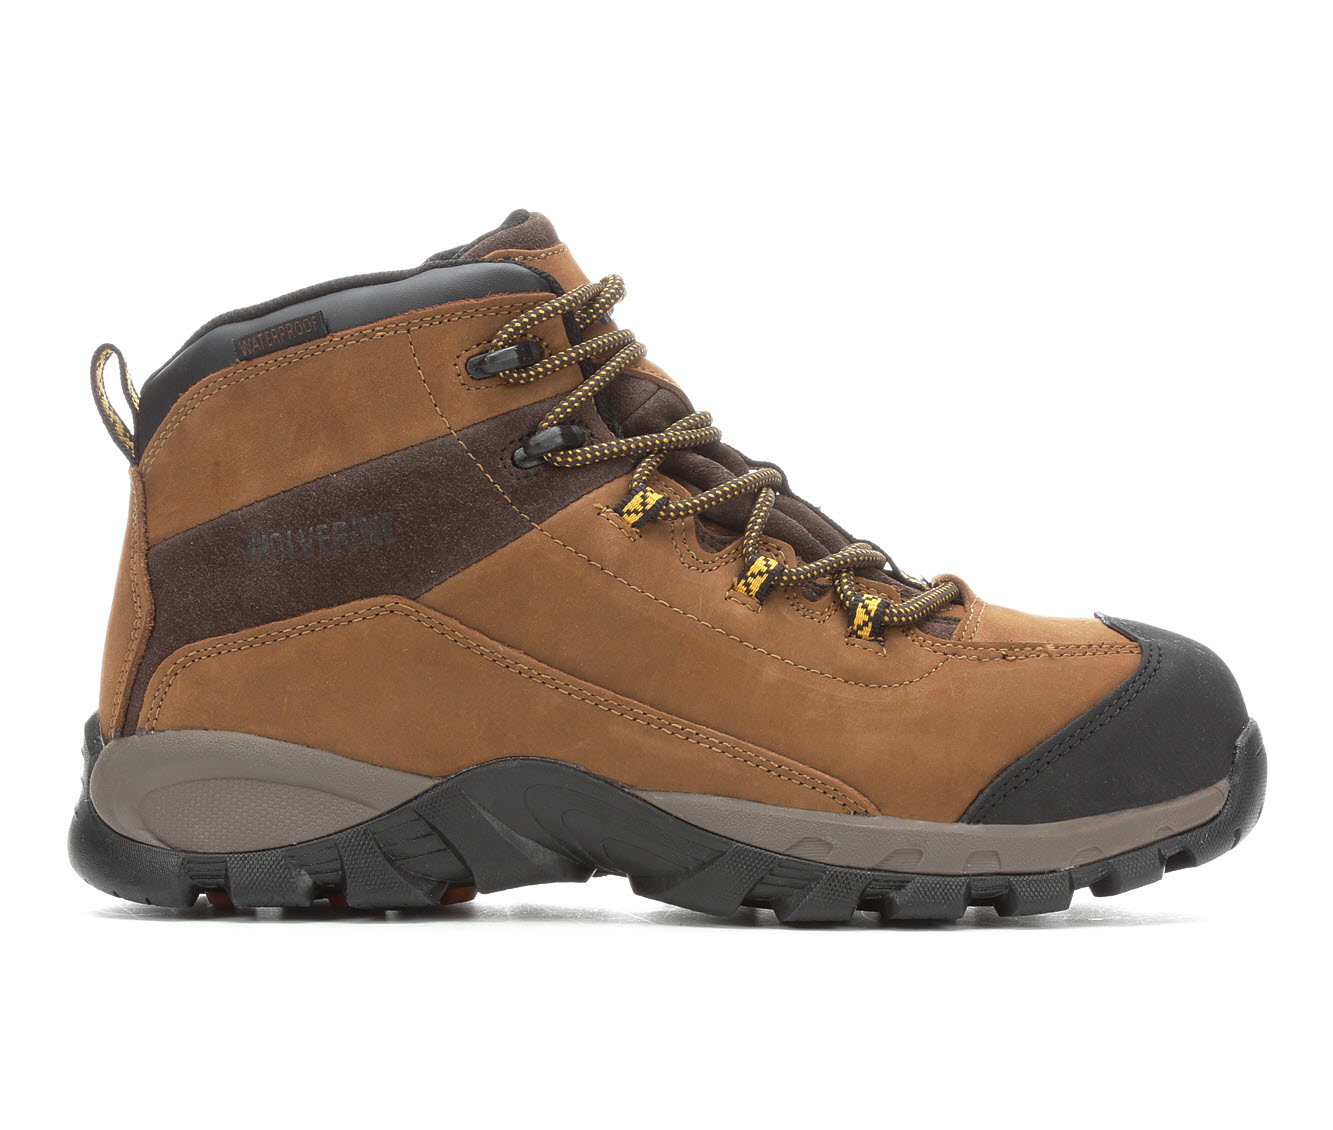 Wolverine Black Ledge 6-inch Steel Toe Waterproof Men's Boots (Brown Leather)